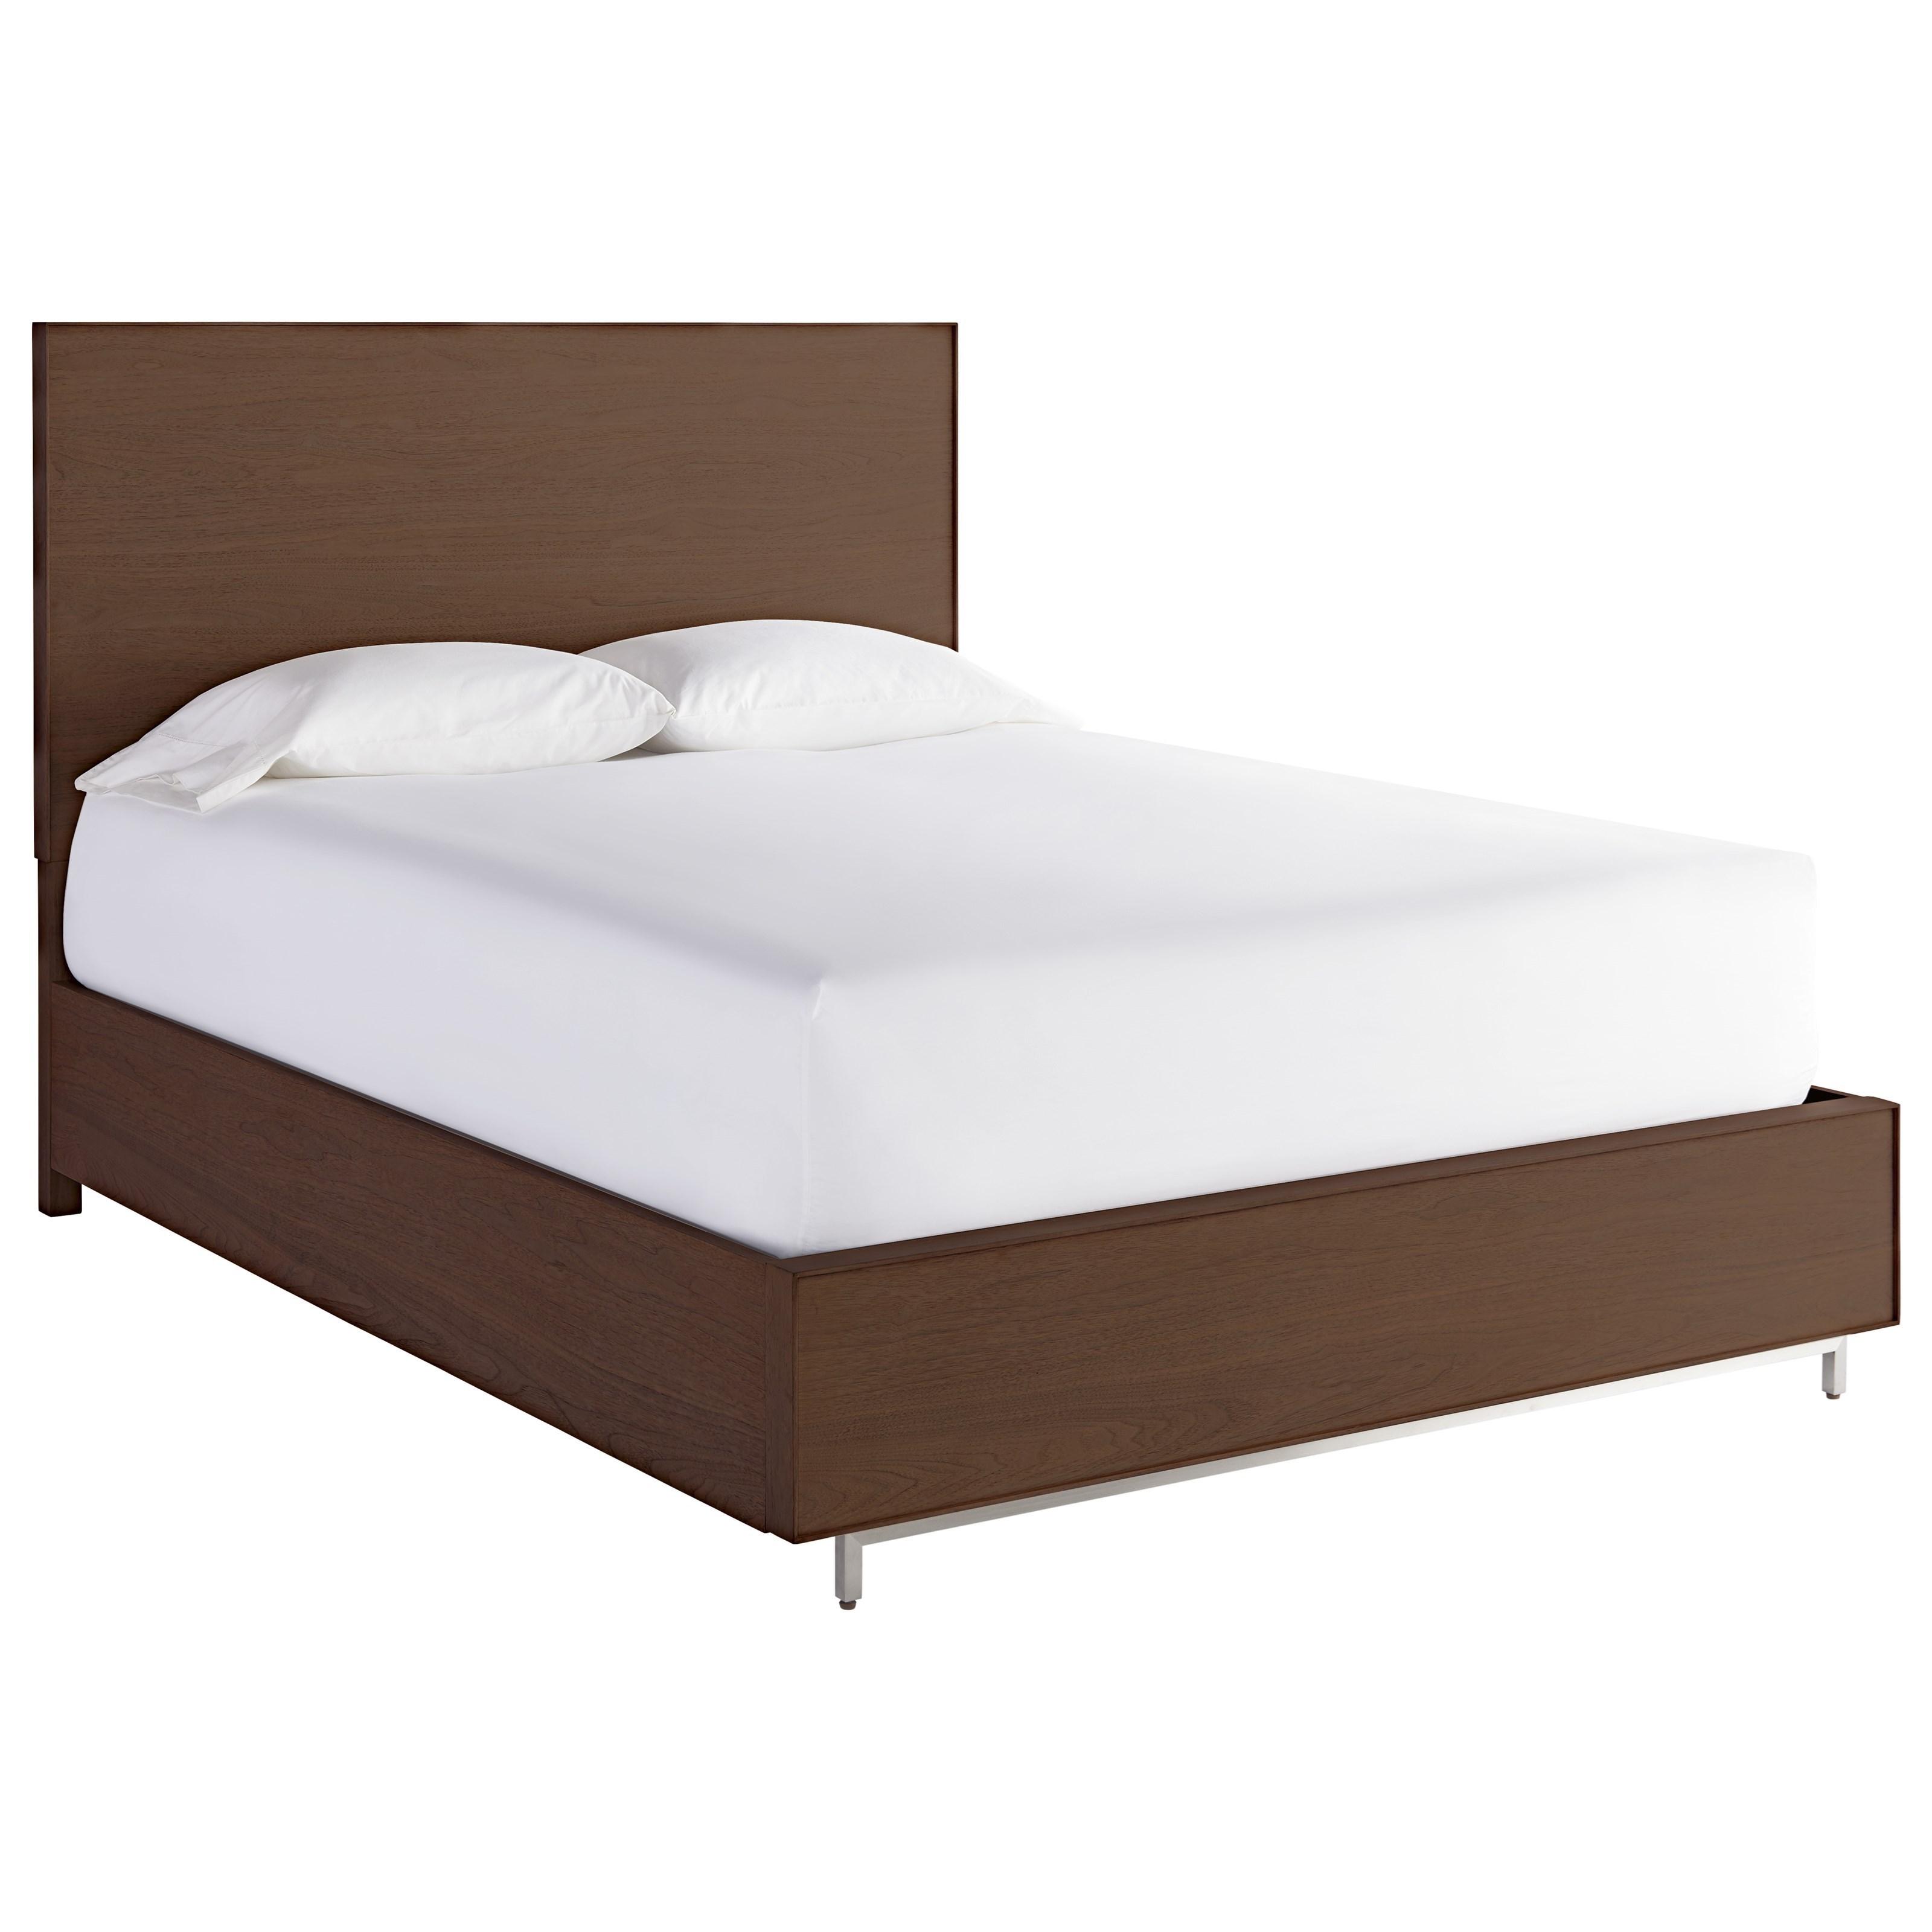 Tanner King Storage Bed